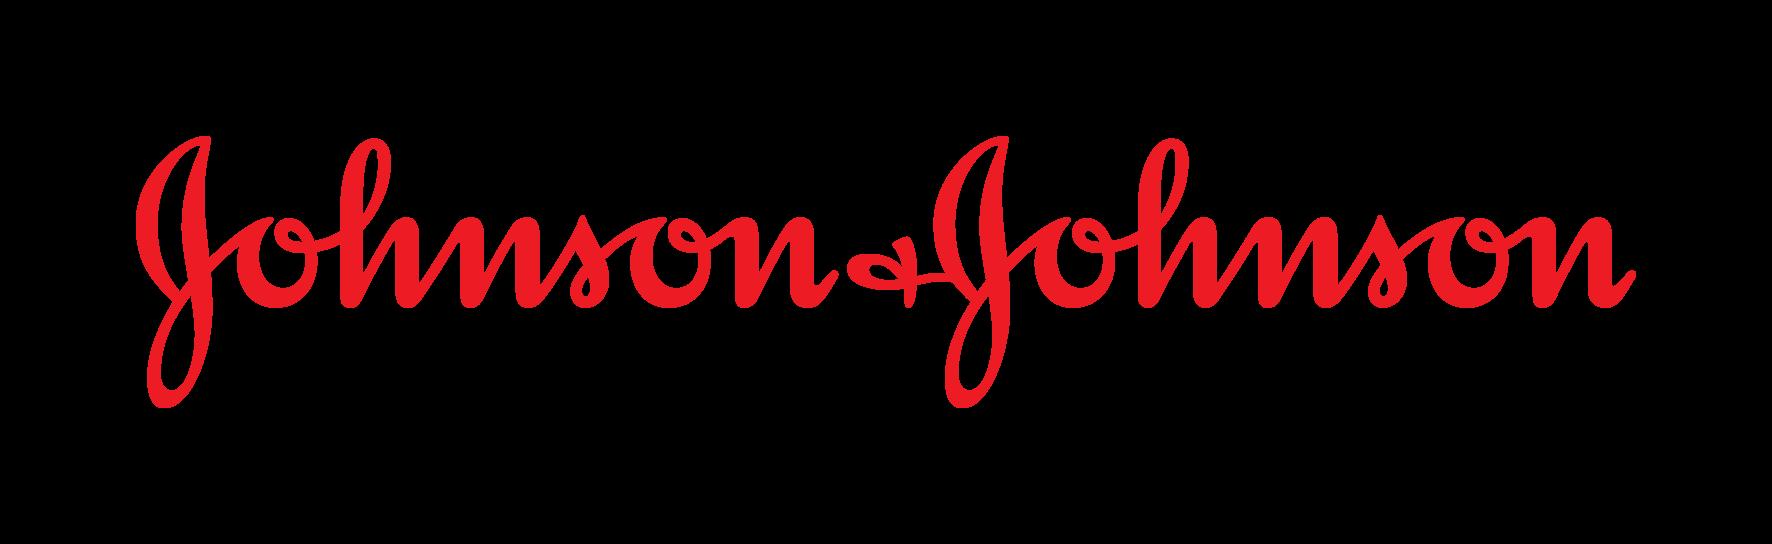 JohnsonJohnson-logo.png